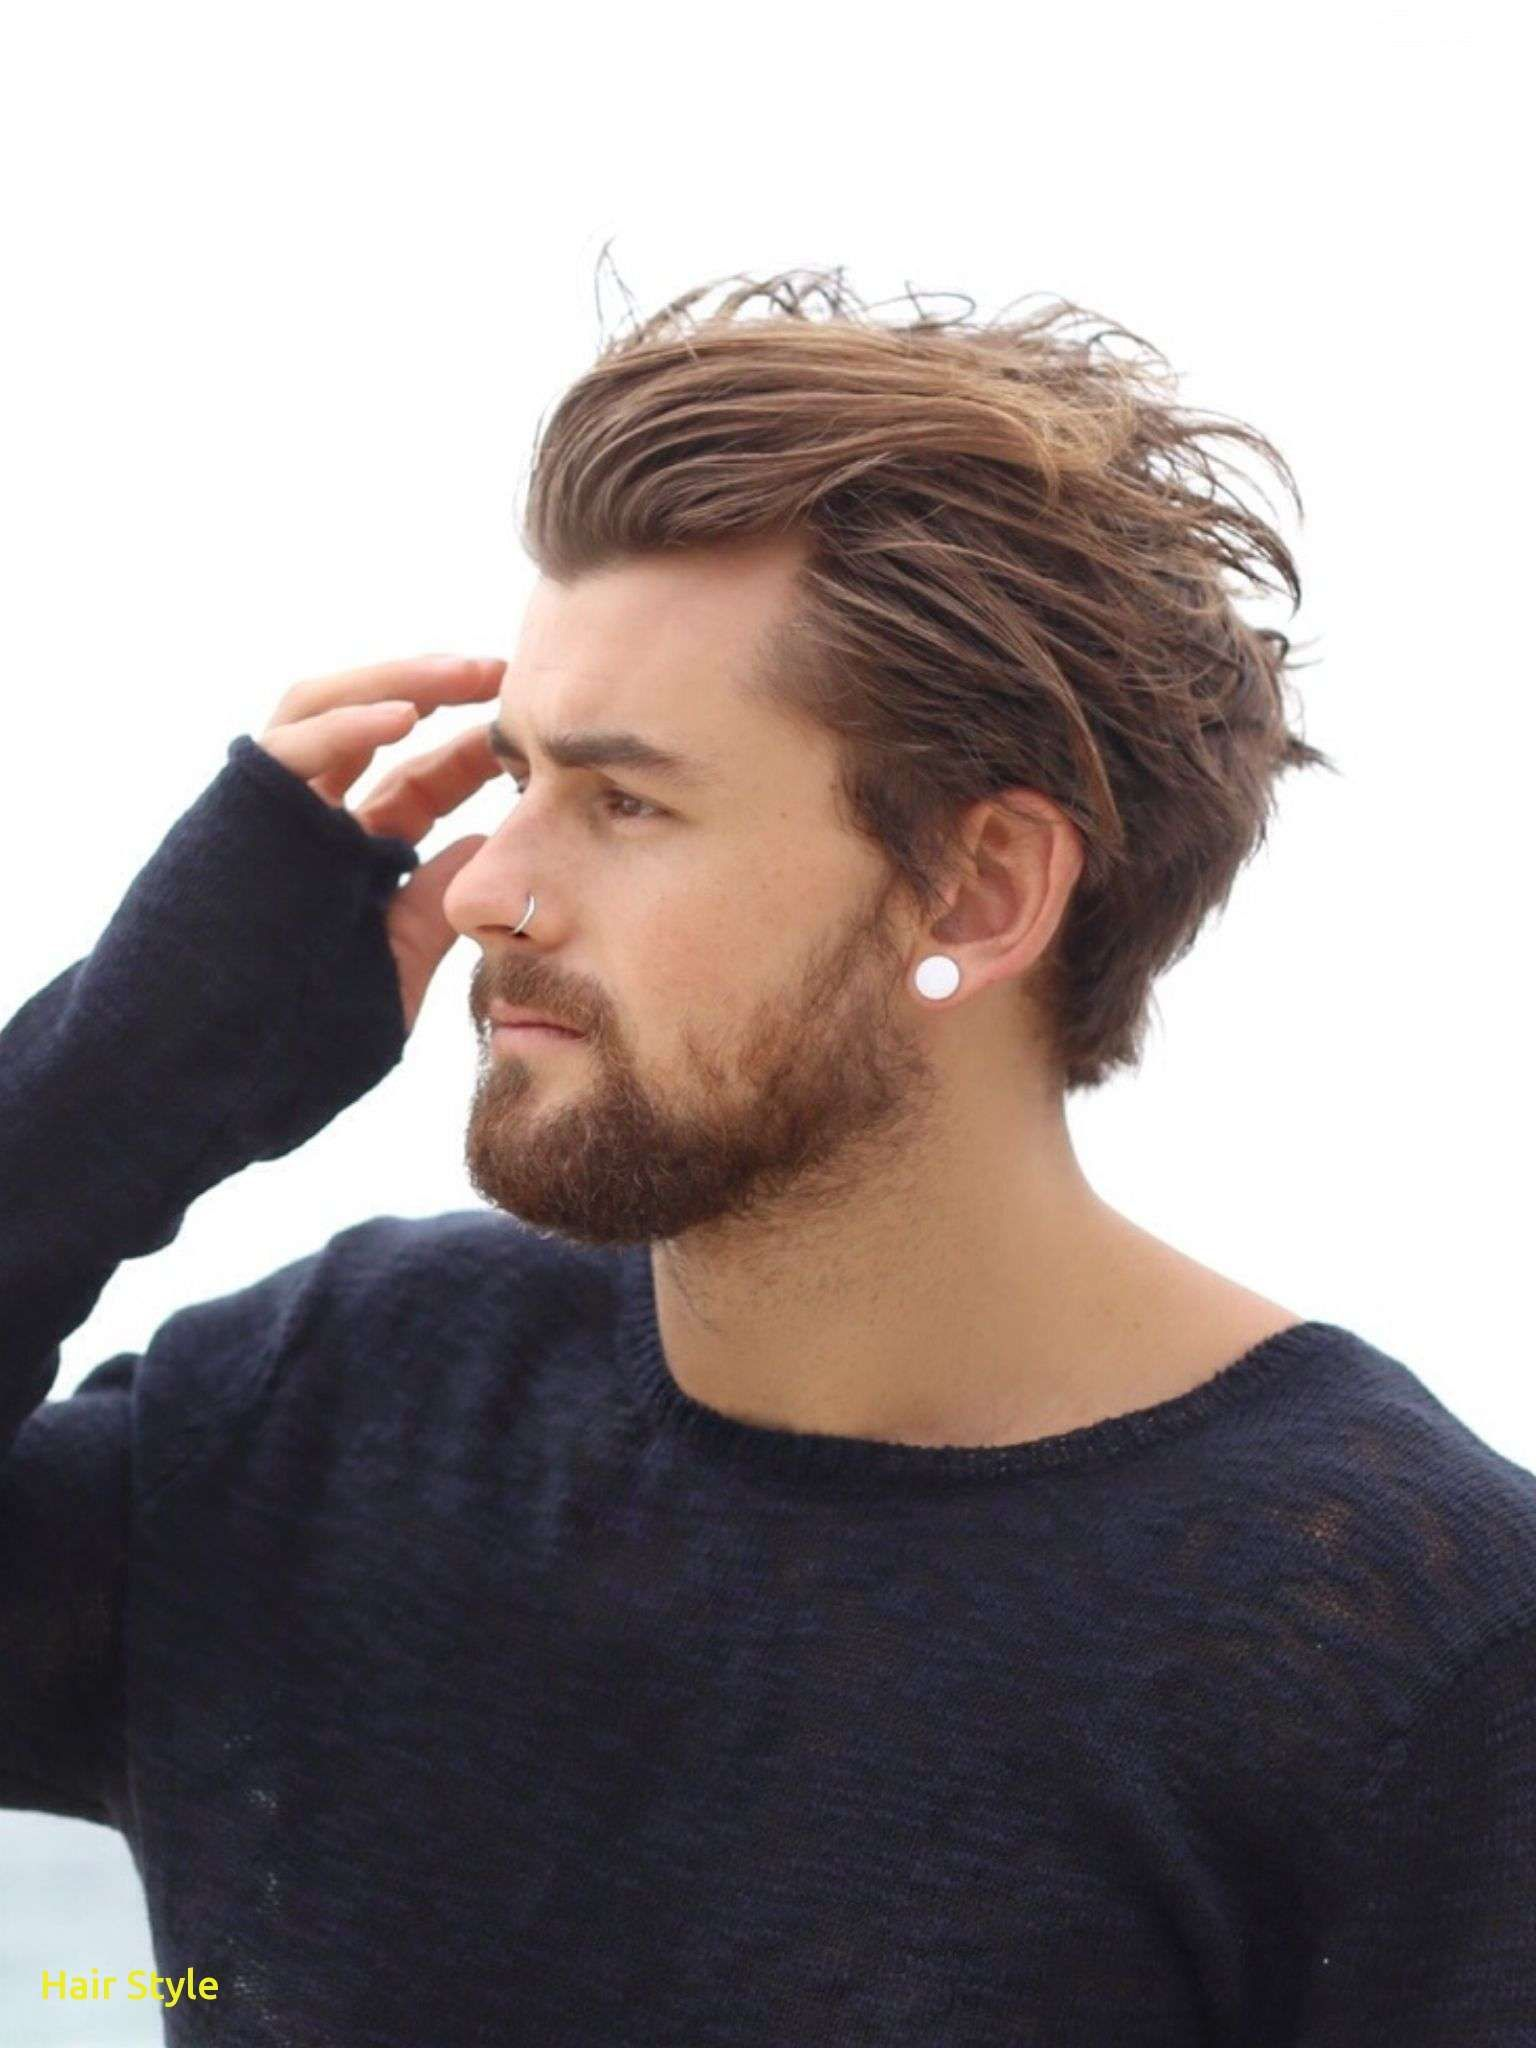 Mittellange Haare Frisuren Manner 2021 Herren Haarschnitt Haare Manner Mittellange Haare Manner